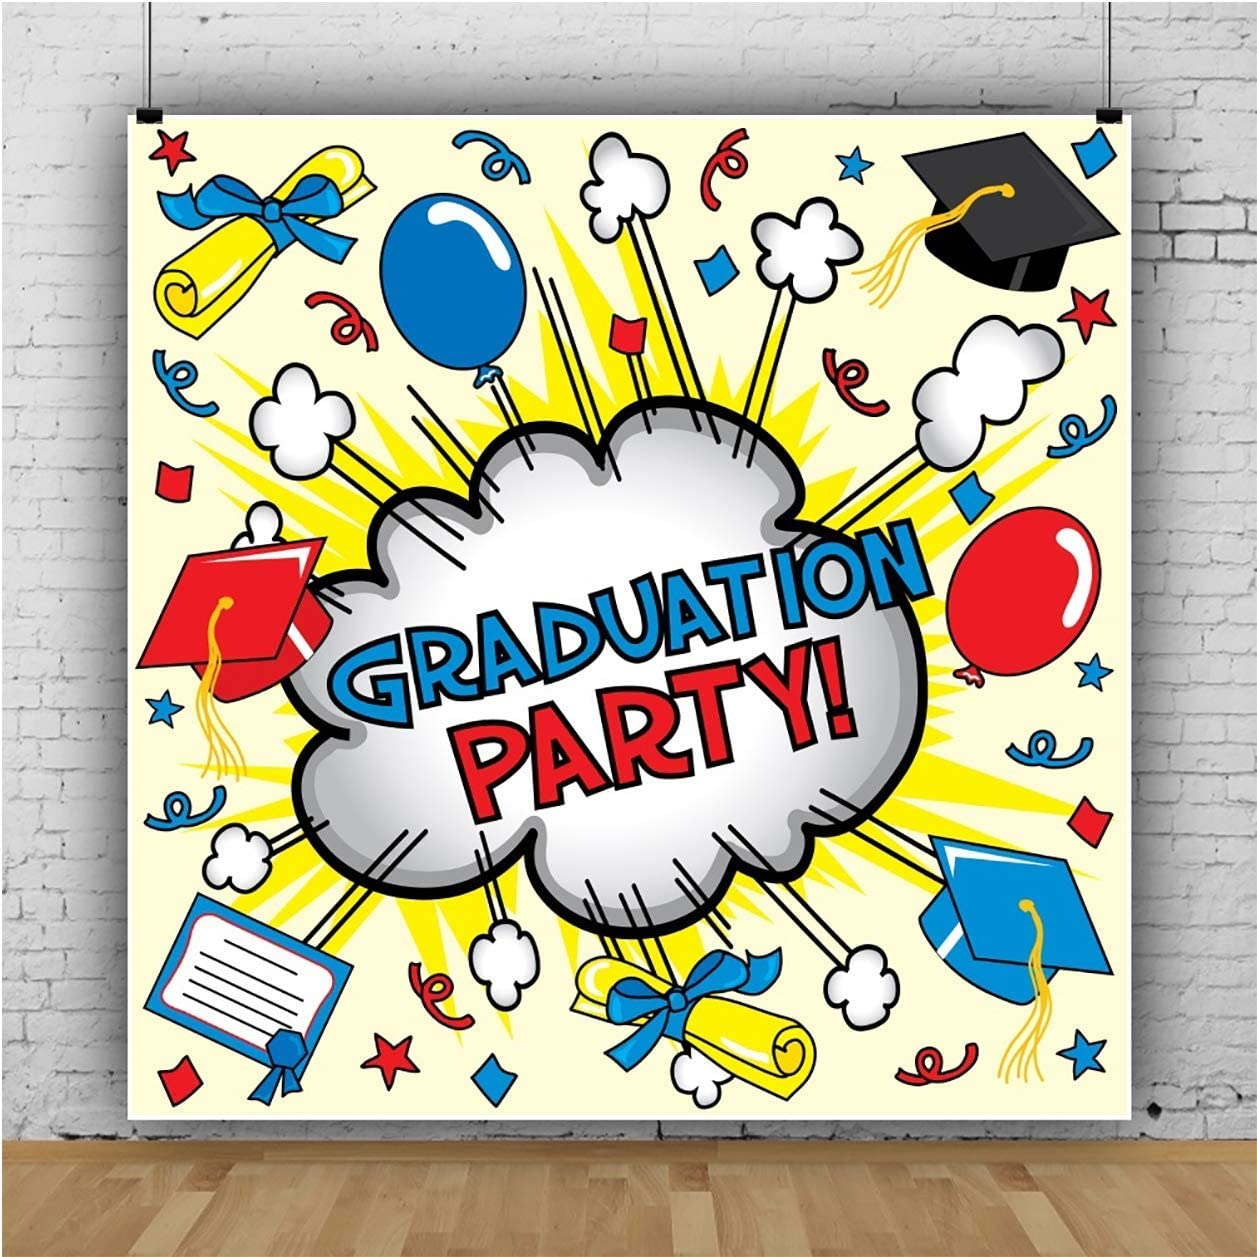 6x6FT Vinyl Photography Backdrop Graduation Party Superhero Themed Boom Graduation Caps Diploma Paper Background Event Graduation Party Decoration Portrait Shoot Studio Photo Booth Props